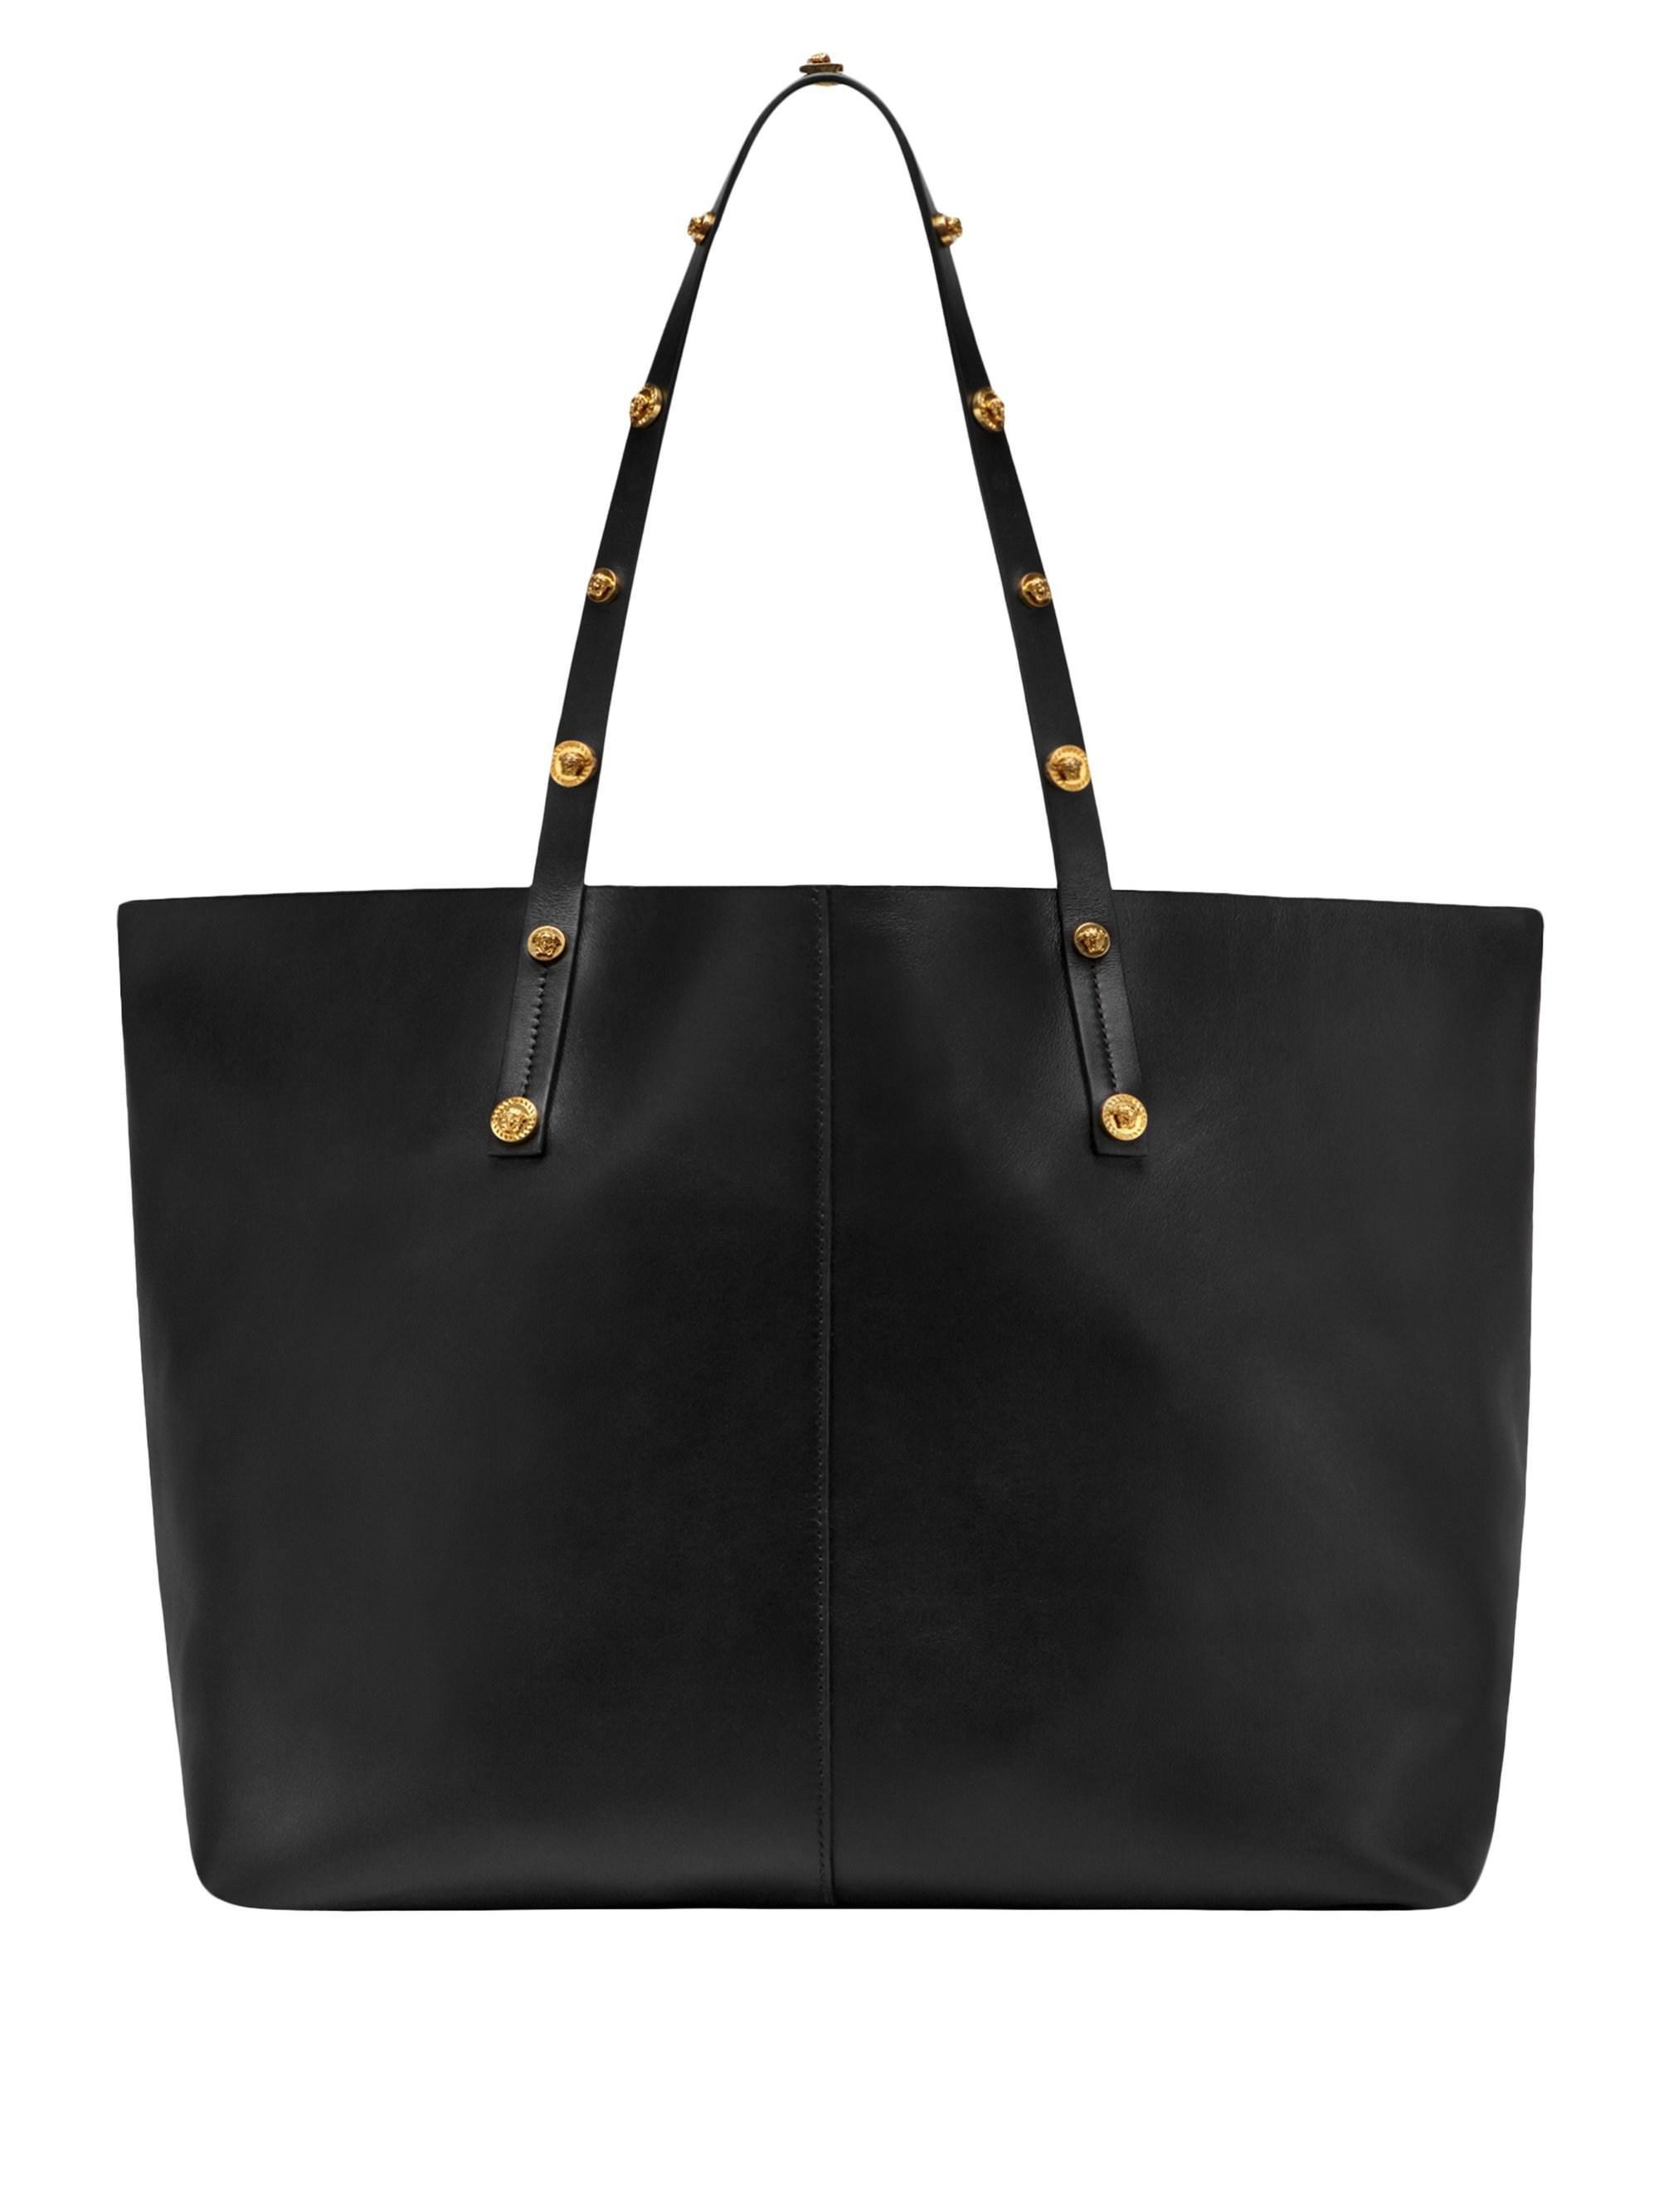 Versace - Black Medusa Studded Leather Tote - Lyst. View fullscreen 6477755b37d0c